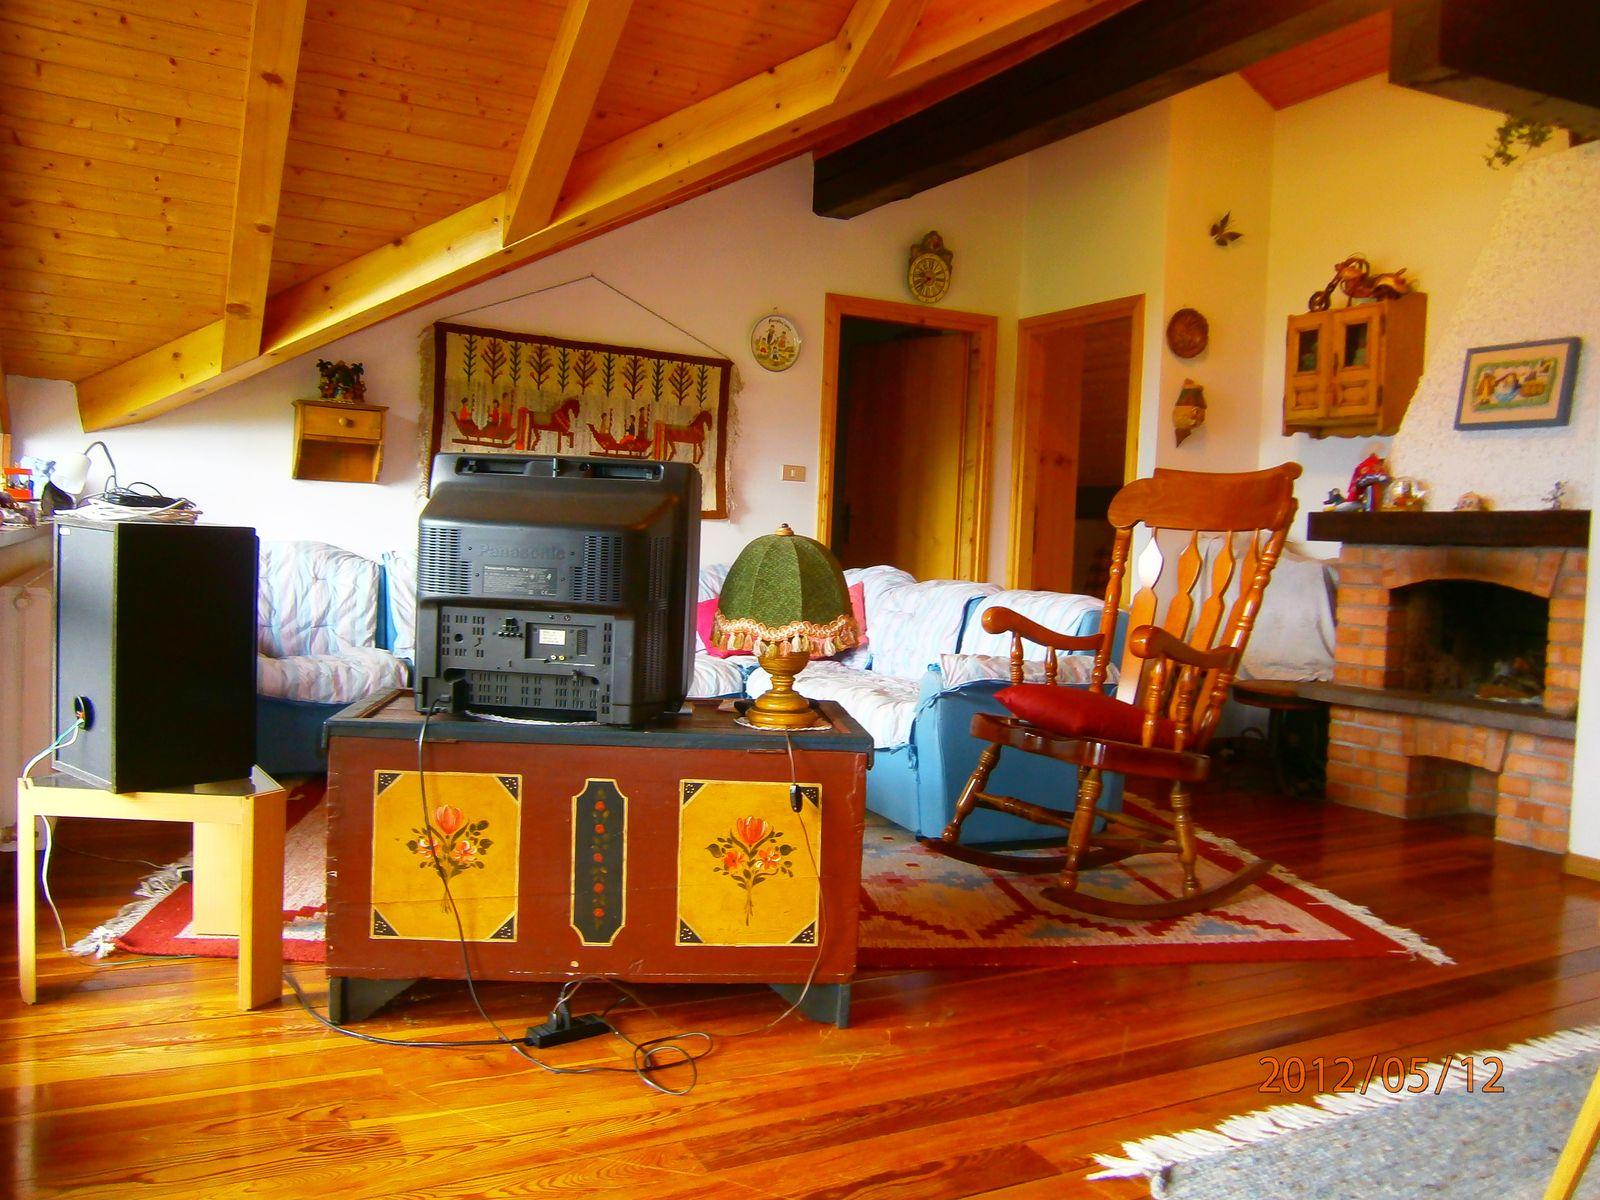 affitto appartamento montagna carano 7998 (20120926190914-2012-24416-NDP.jpg)